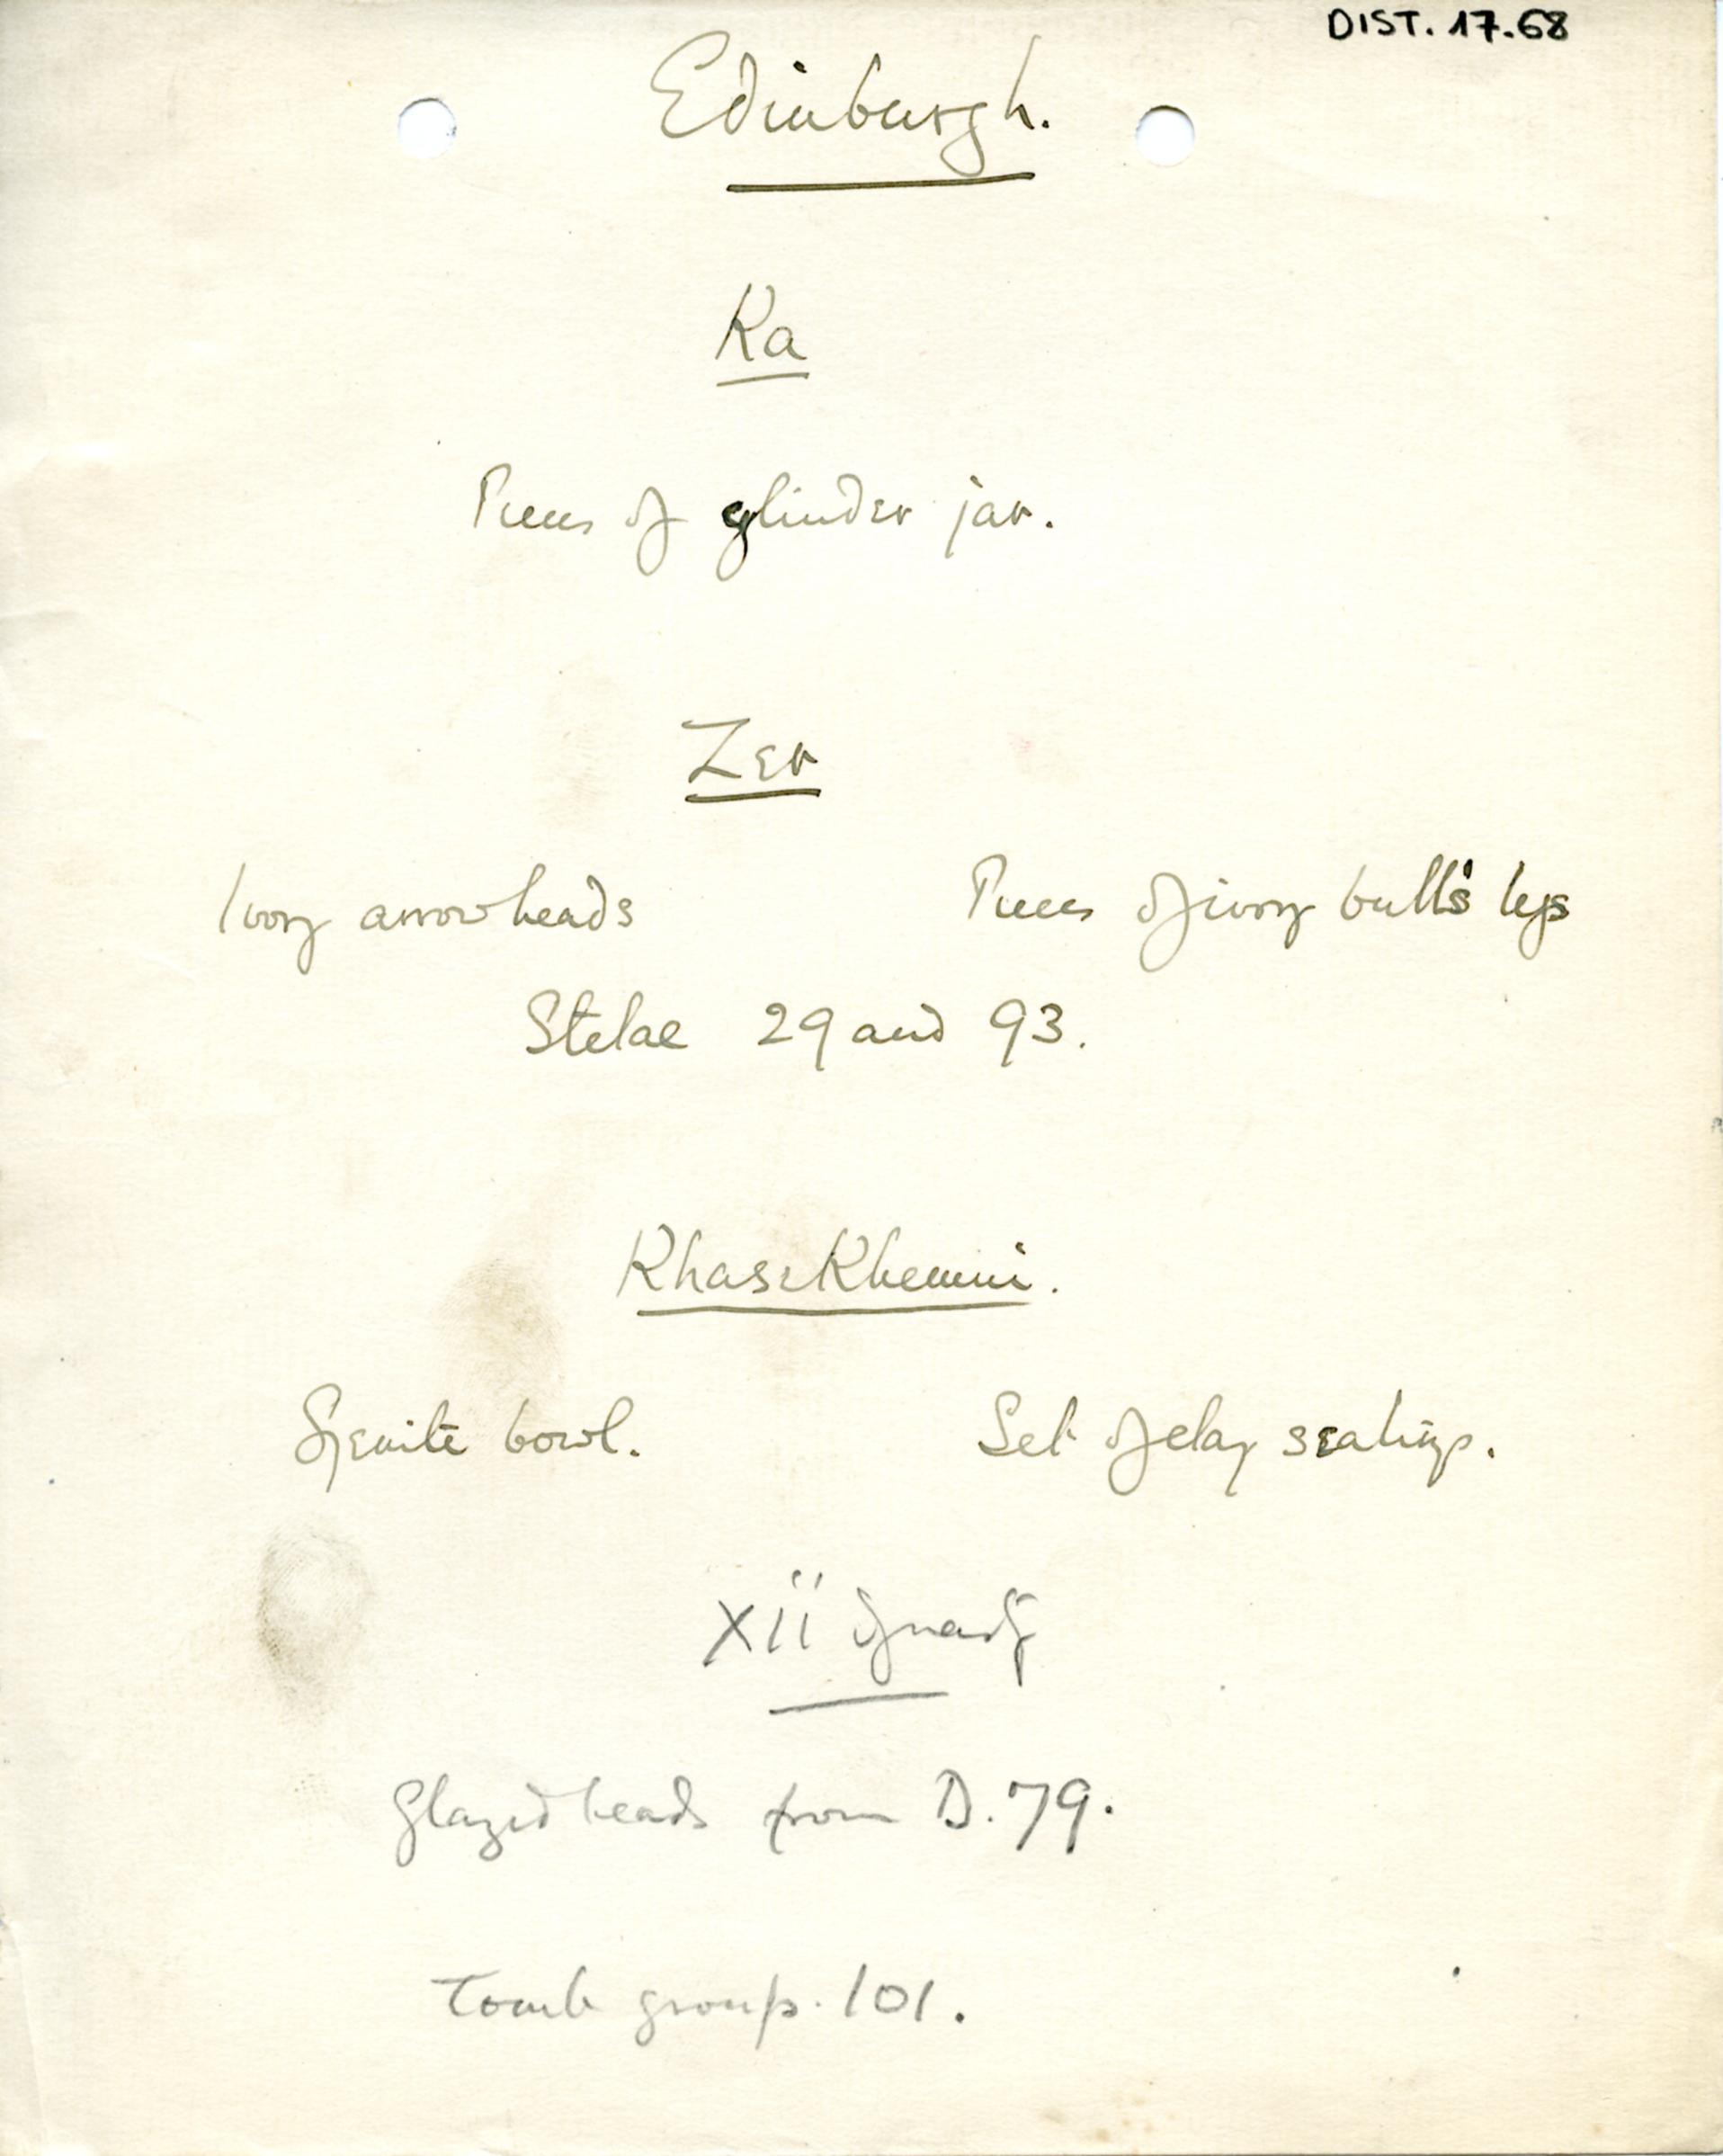 1898-1899 Hu, 1899-1900 Abydos DIST.17.68